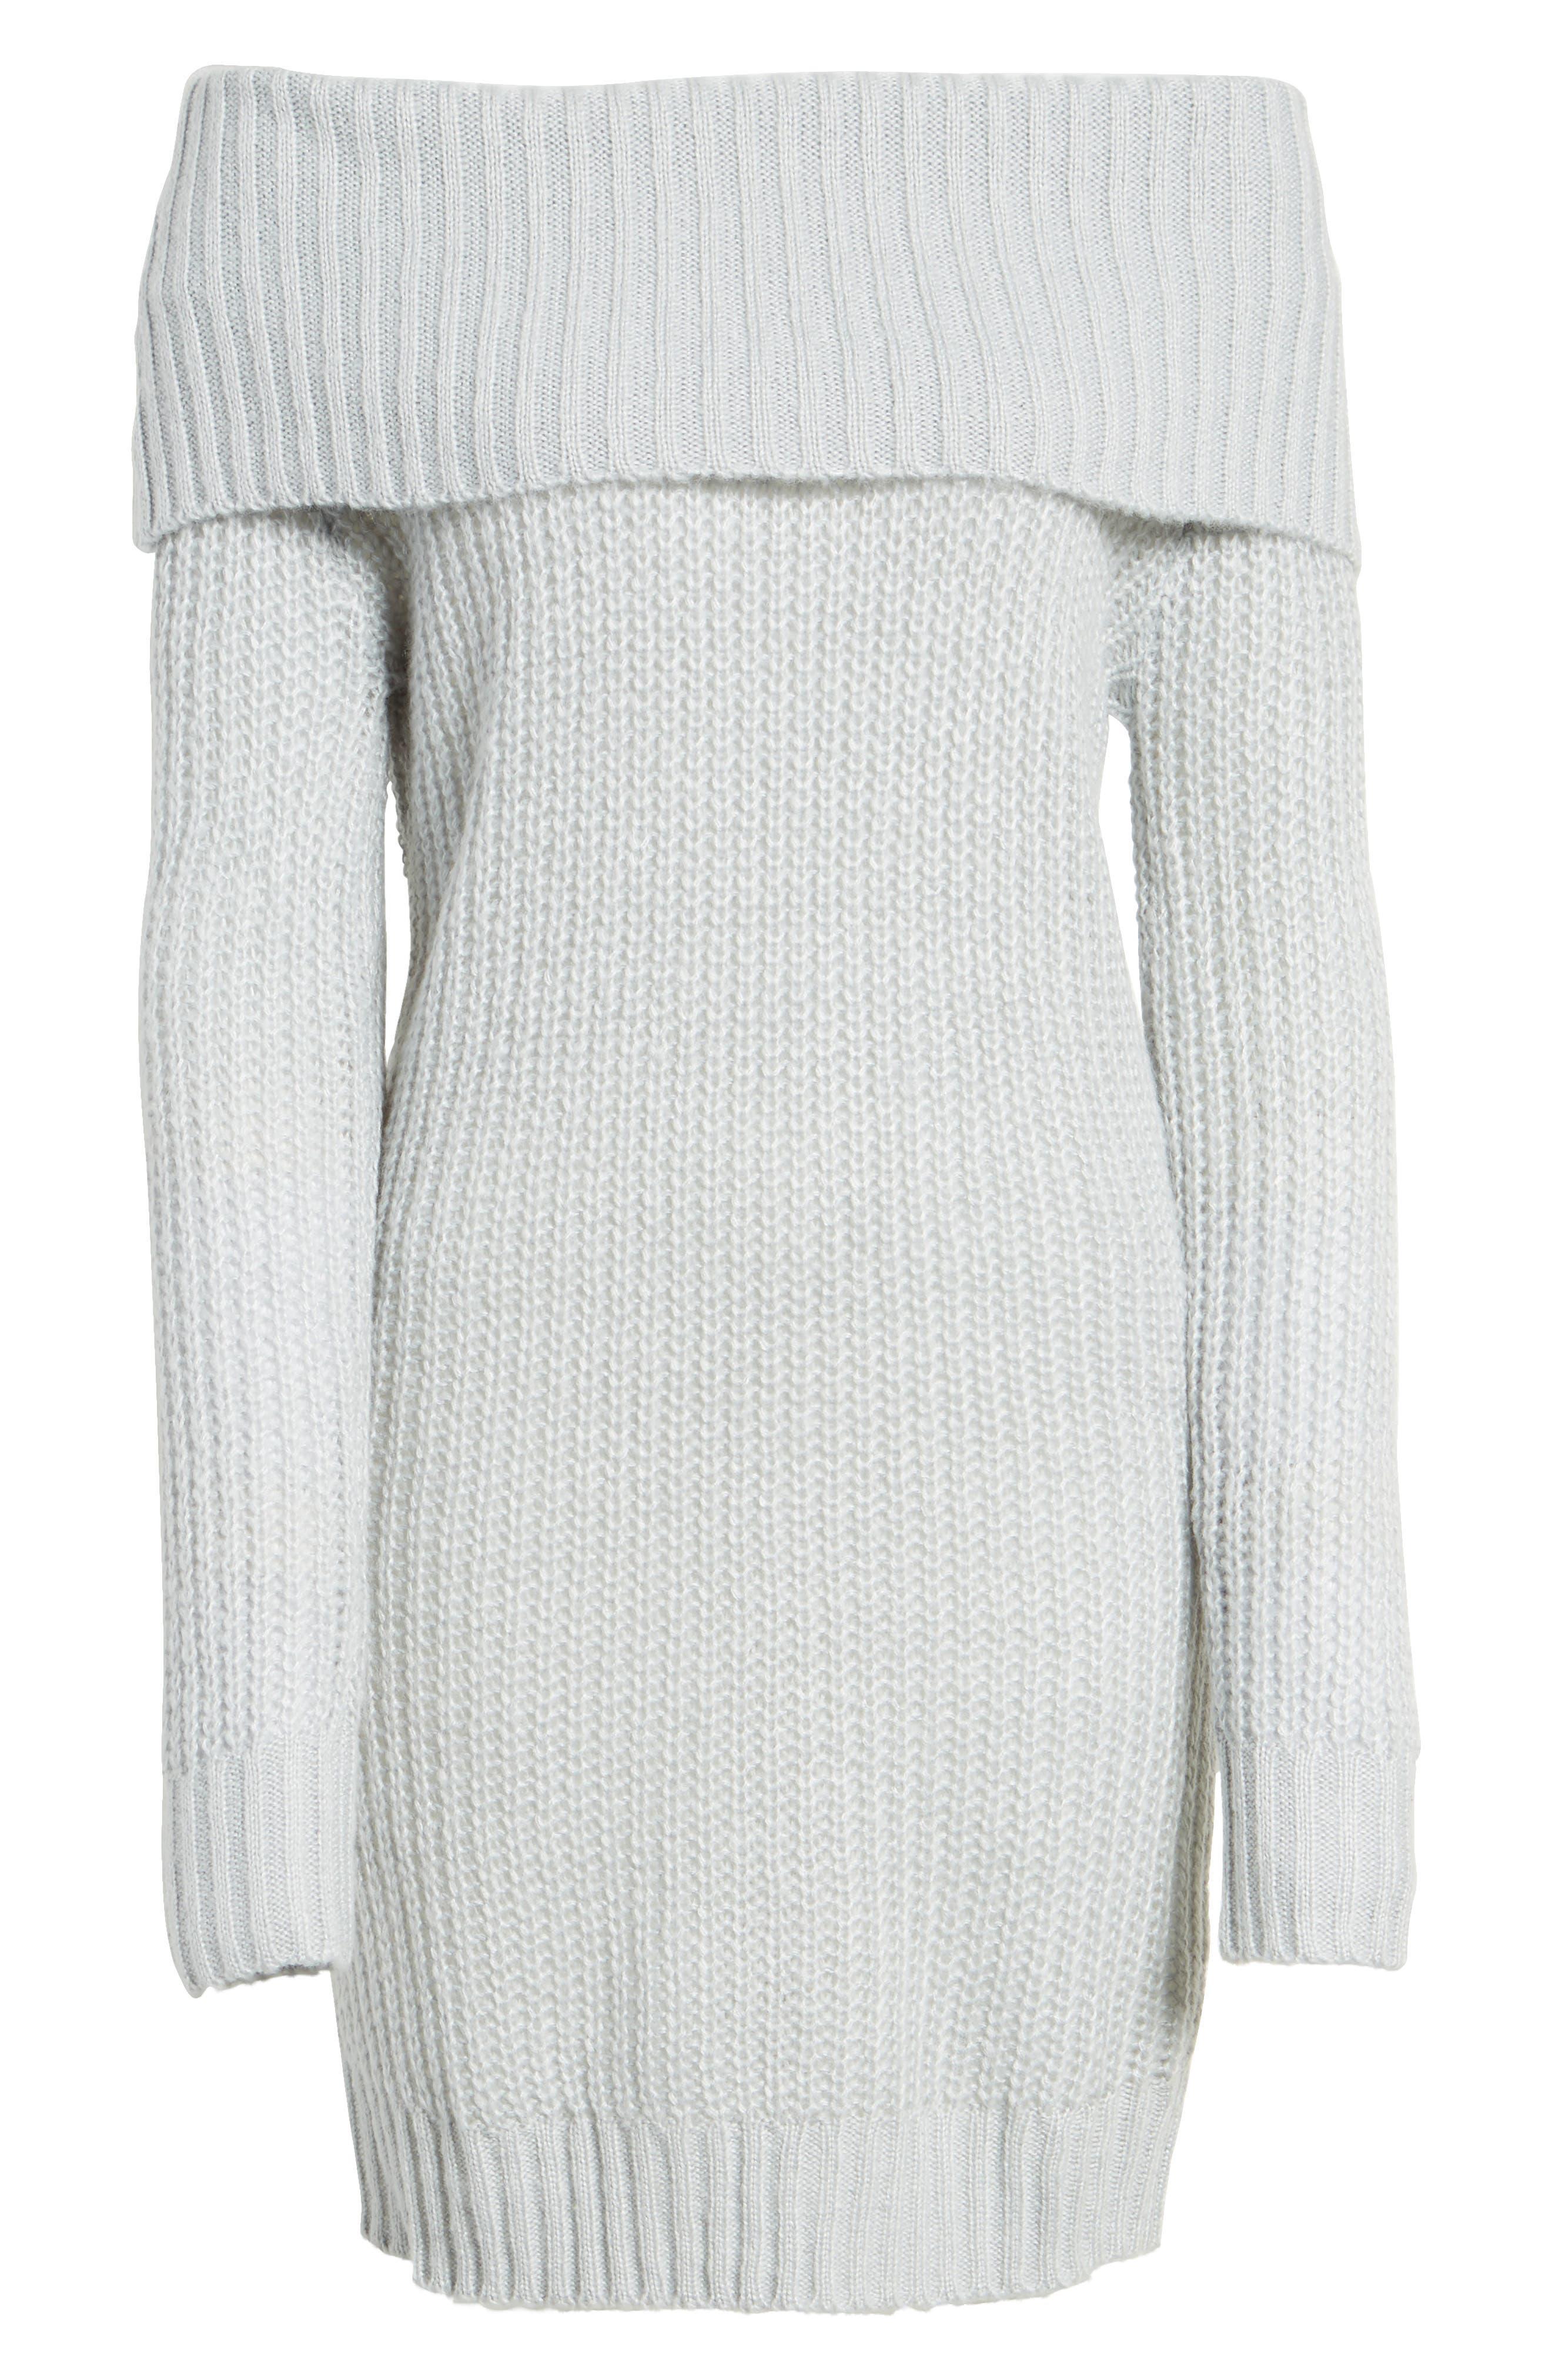 Foldover Off the Shoulder Sweater Dress,                             Alternate thumbnail 22, color,